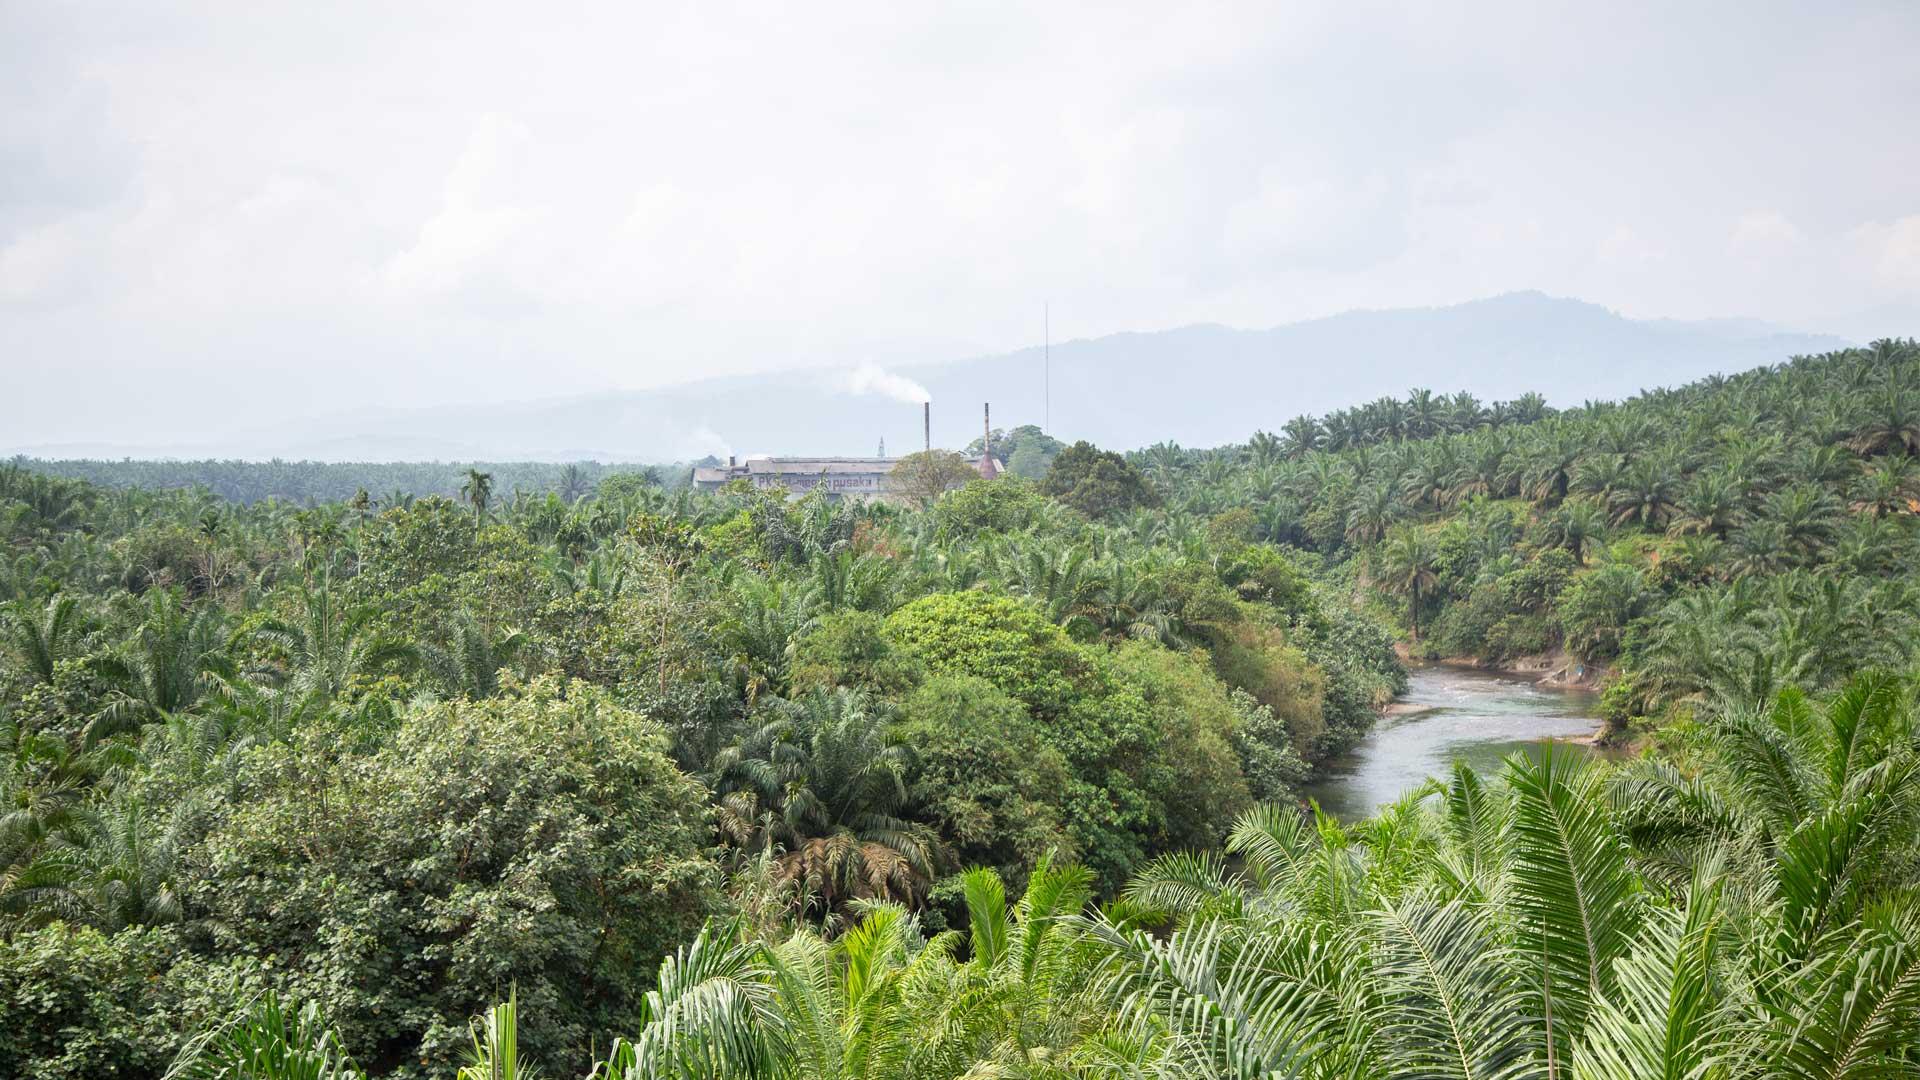 https://rfacdn.nz/zoo/assets/media/palm-oil-sumatra-gallery-10.jpg